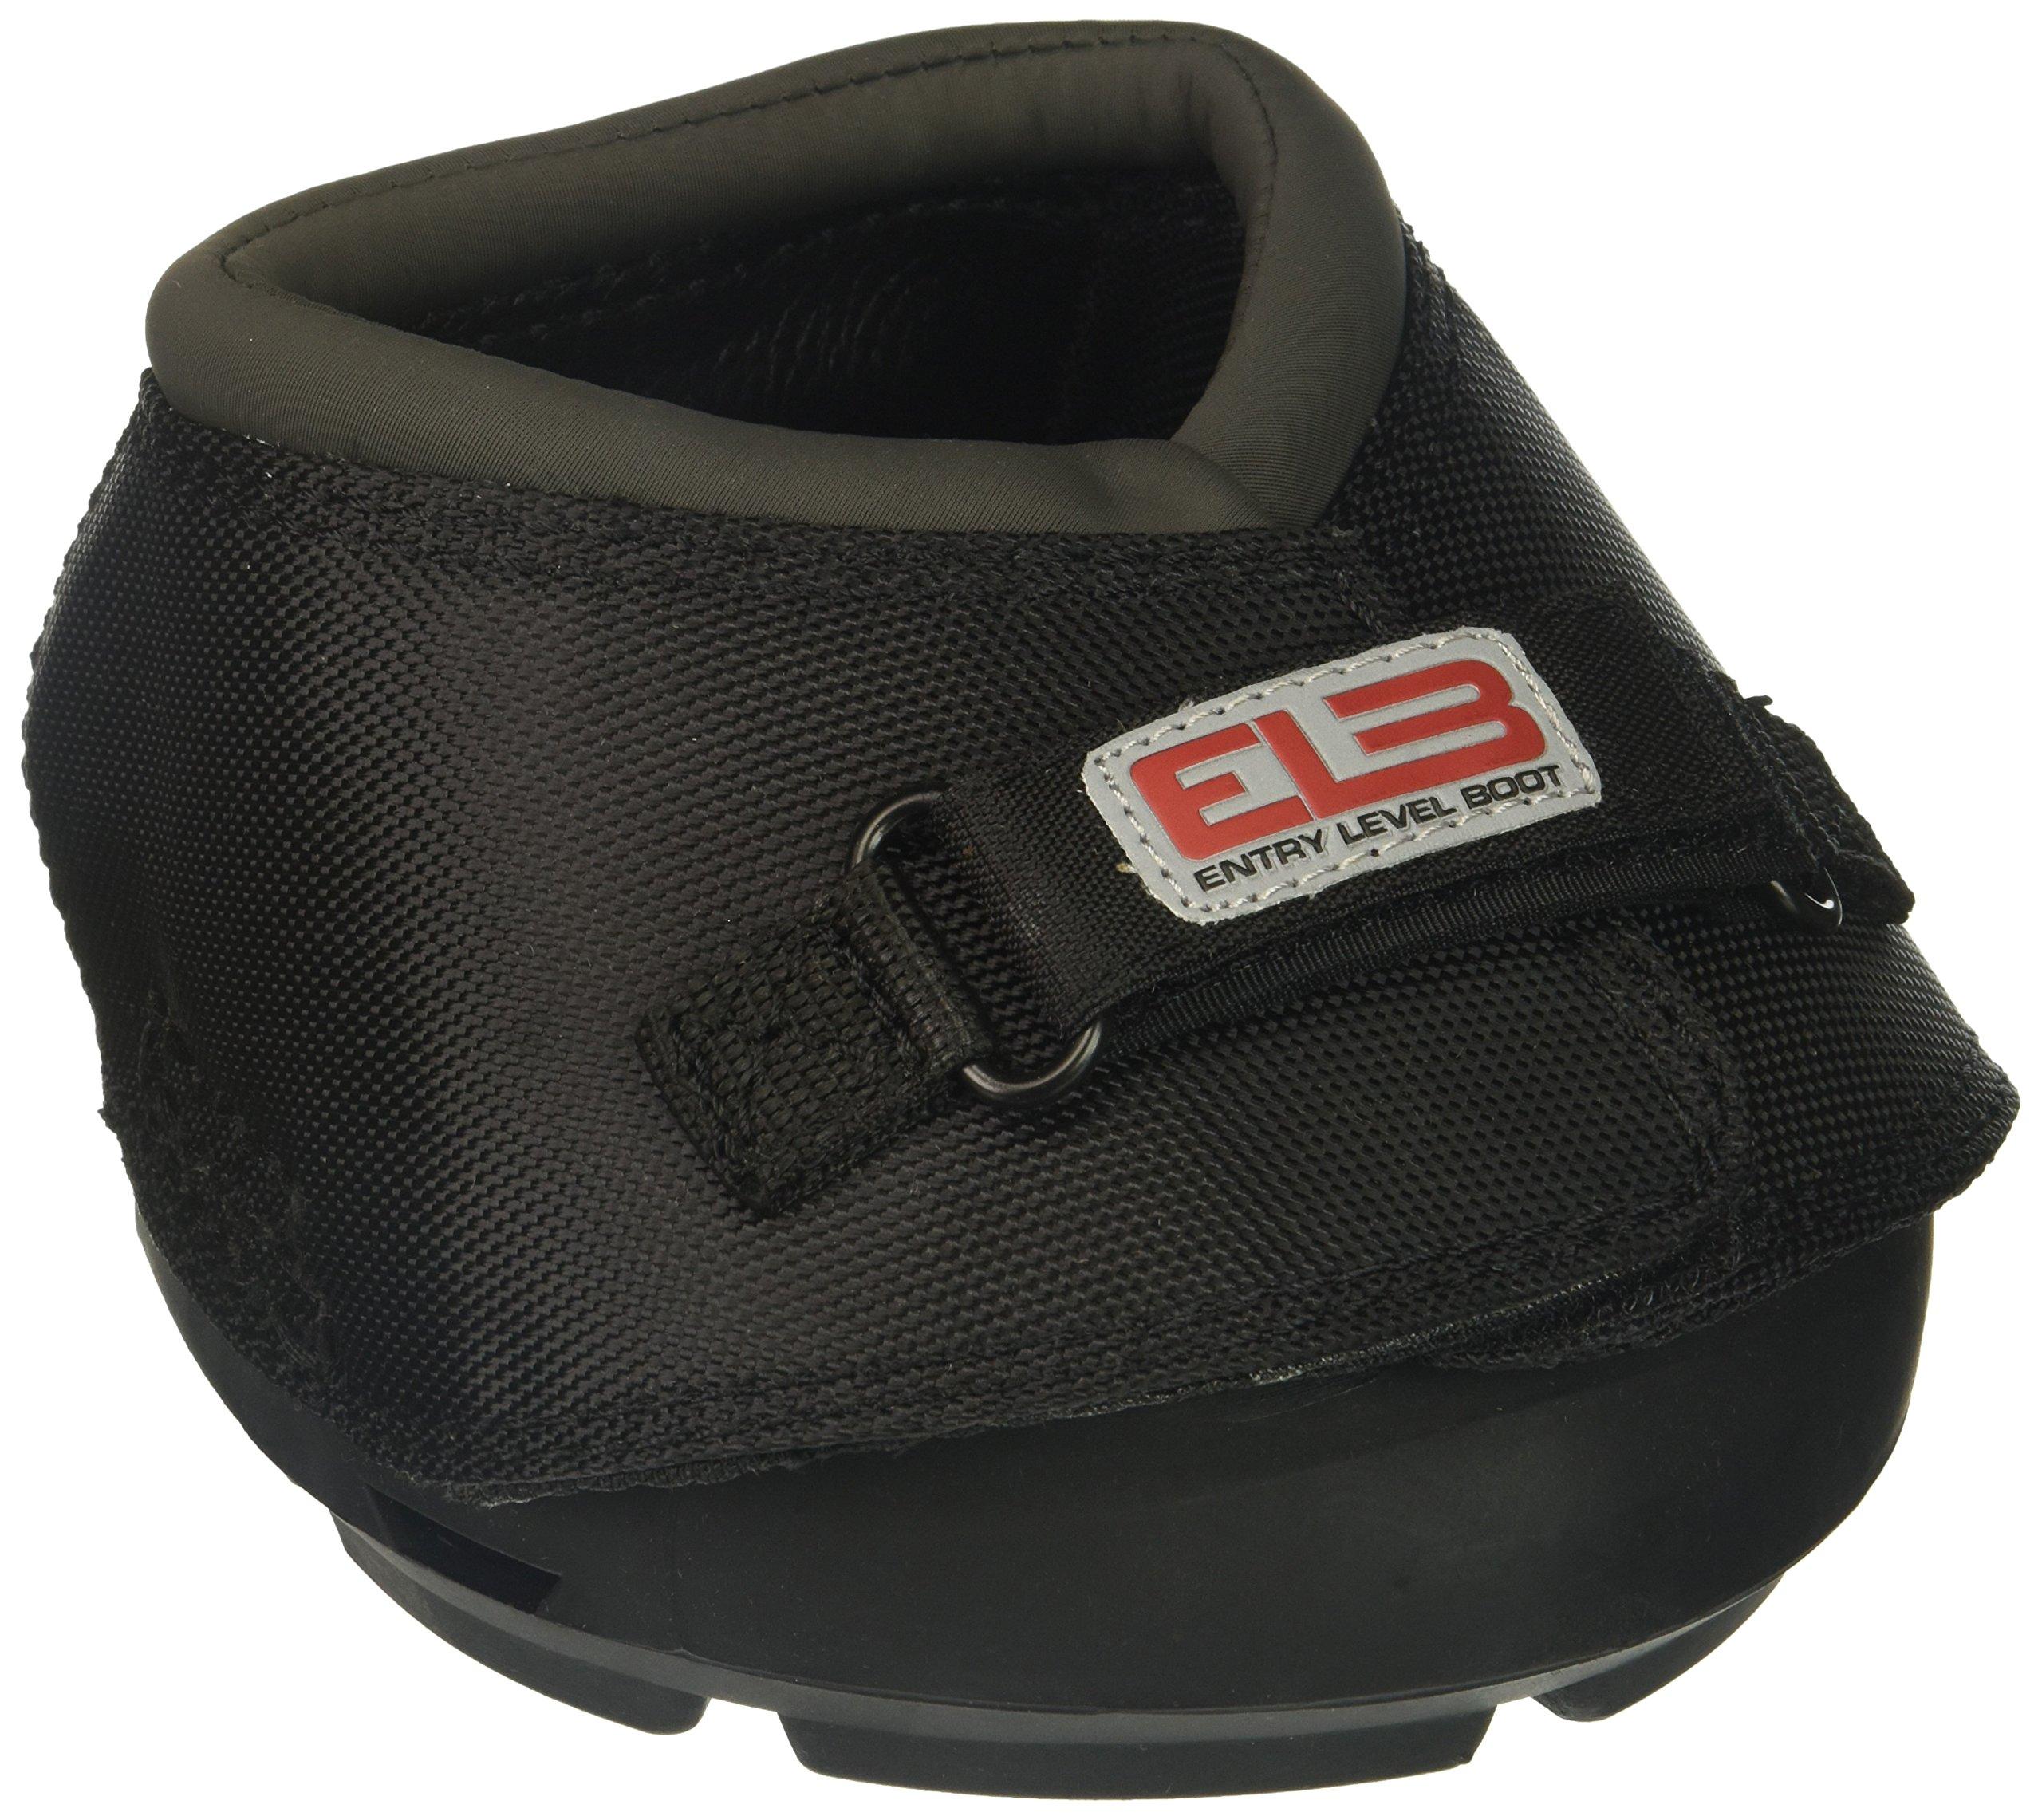 Cavallo Horse & Rider DELBR-3 ELB Regular Sole Hoof Boot, Size 3, Black